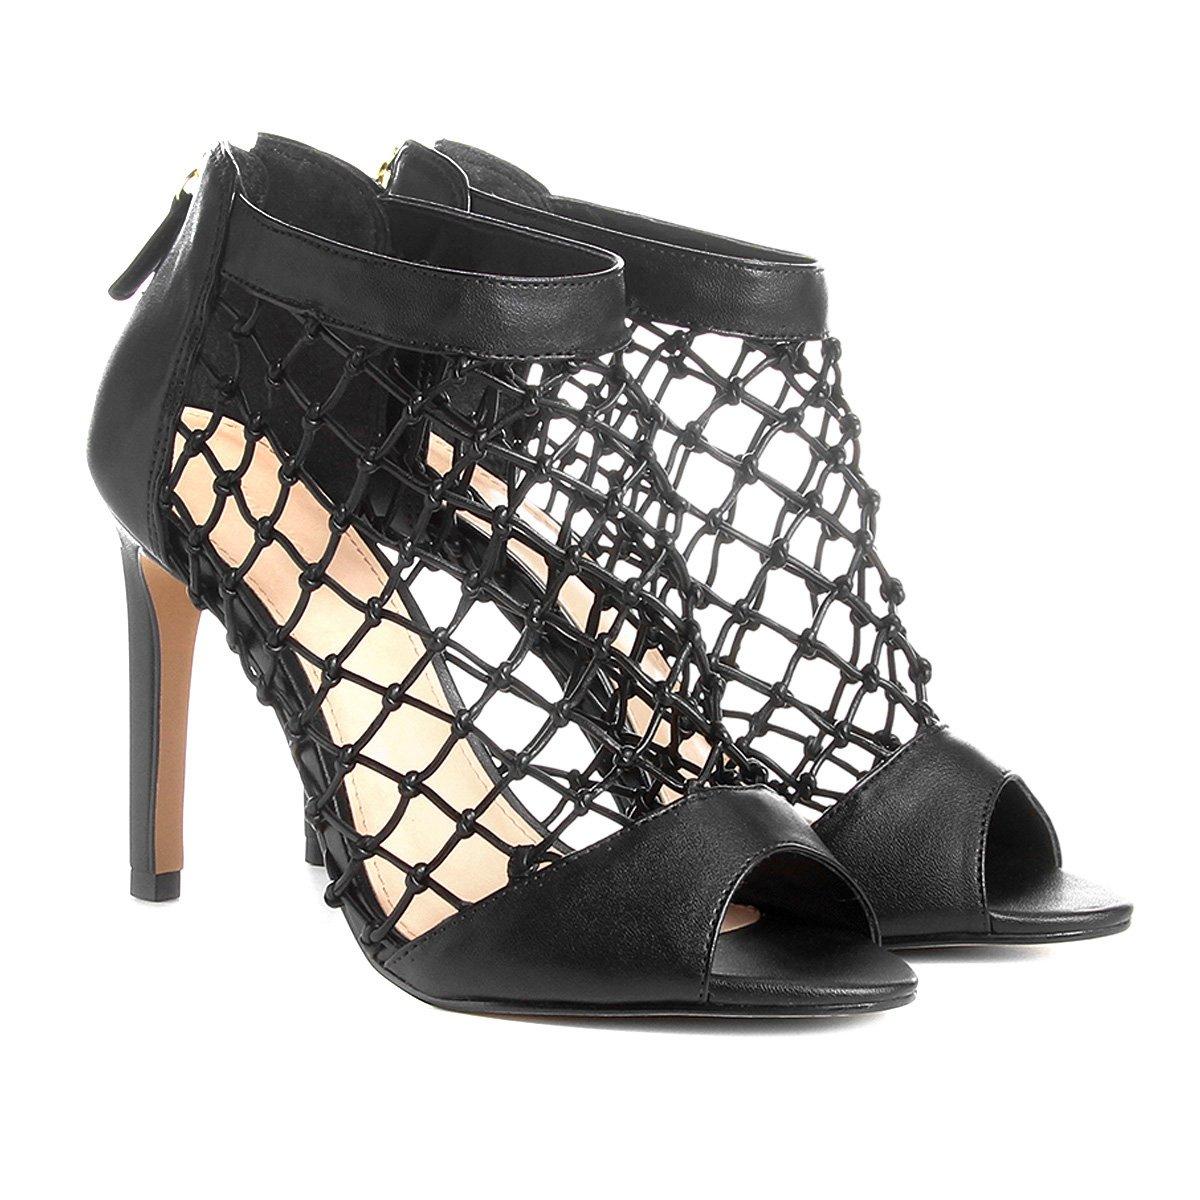 5e77d8eb5 Sandália Shoestock Salto Fino Macramê Feminina | Shoestock